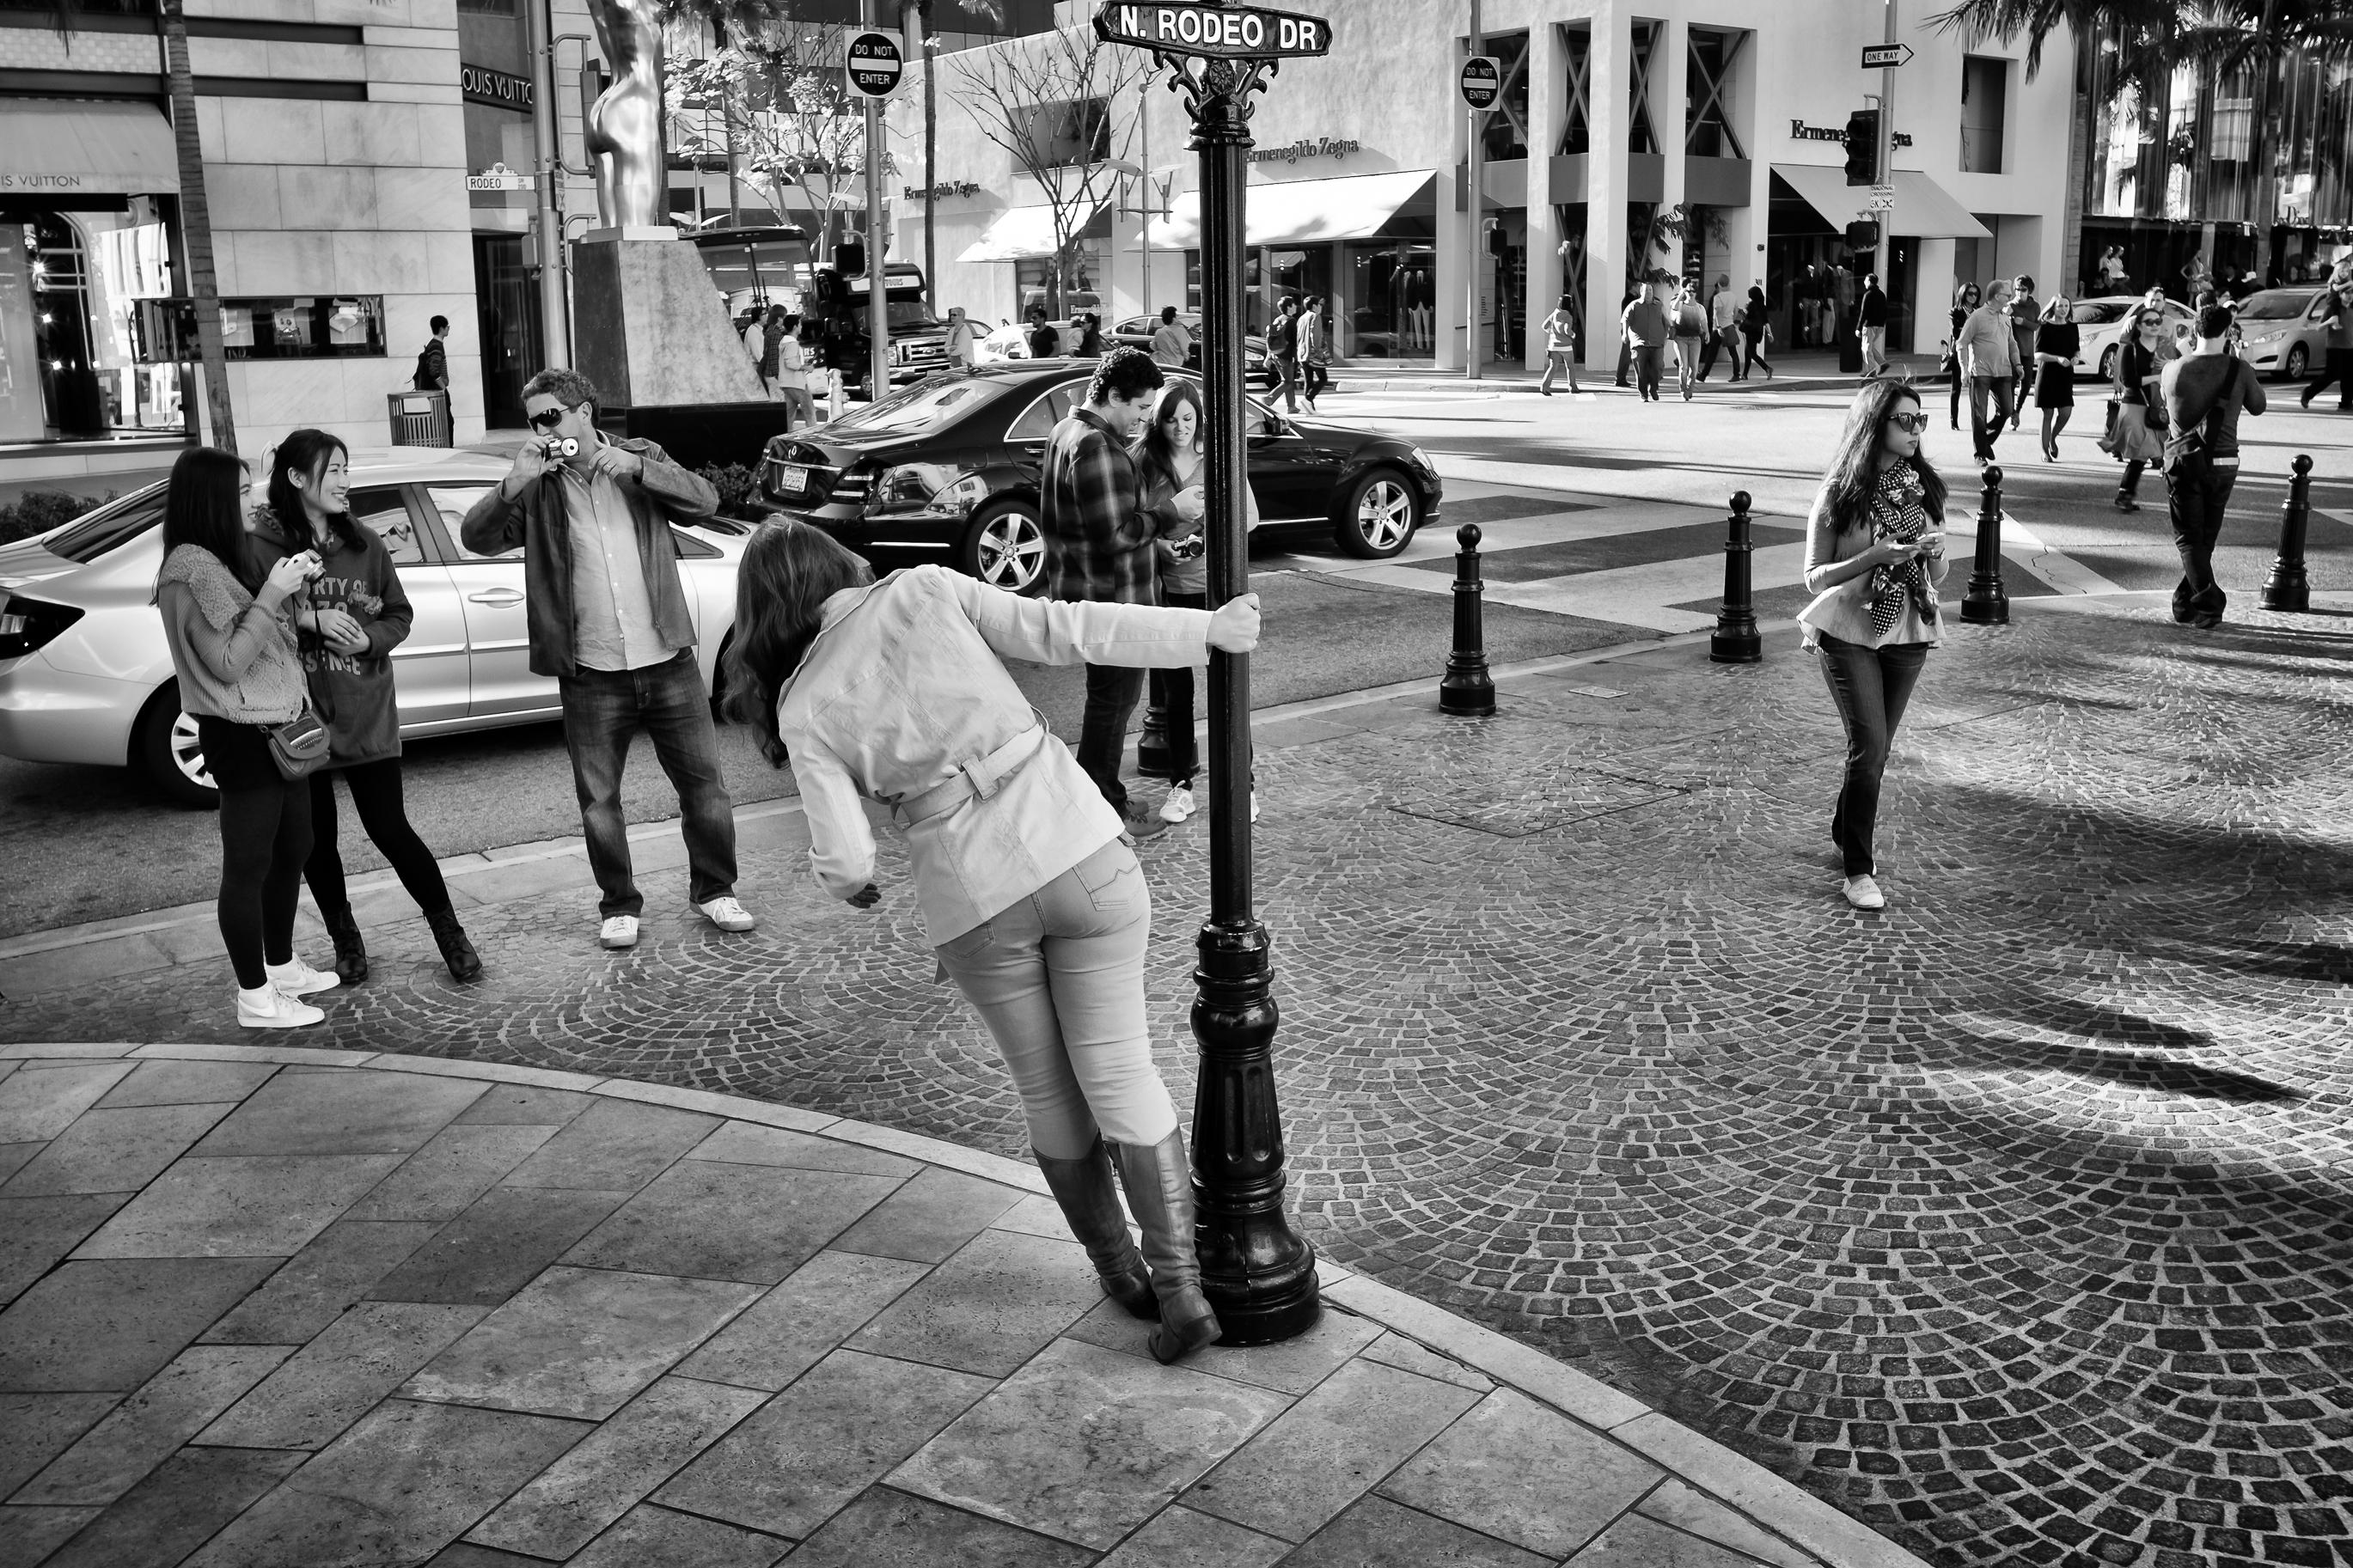 Street Photography | UCLA Extension Visual Arts